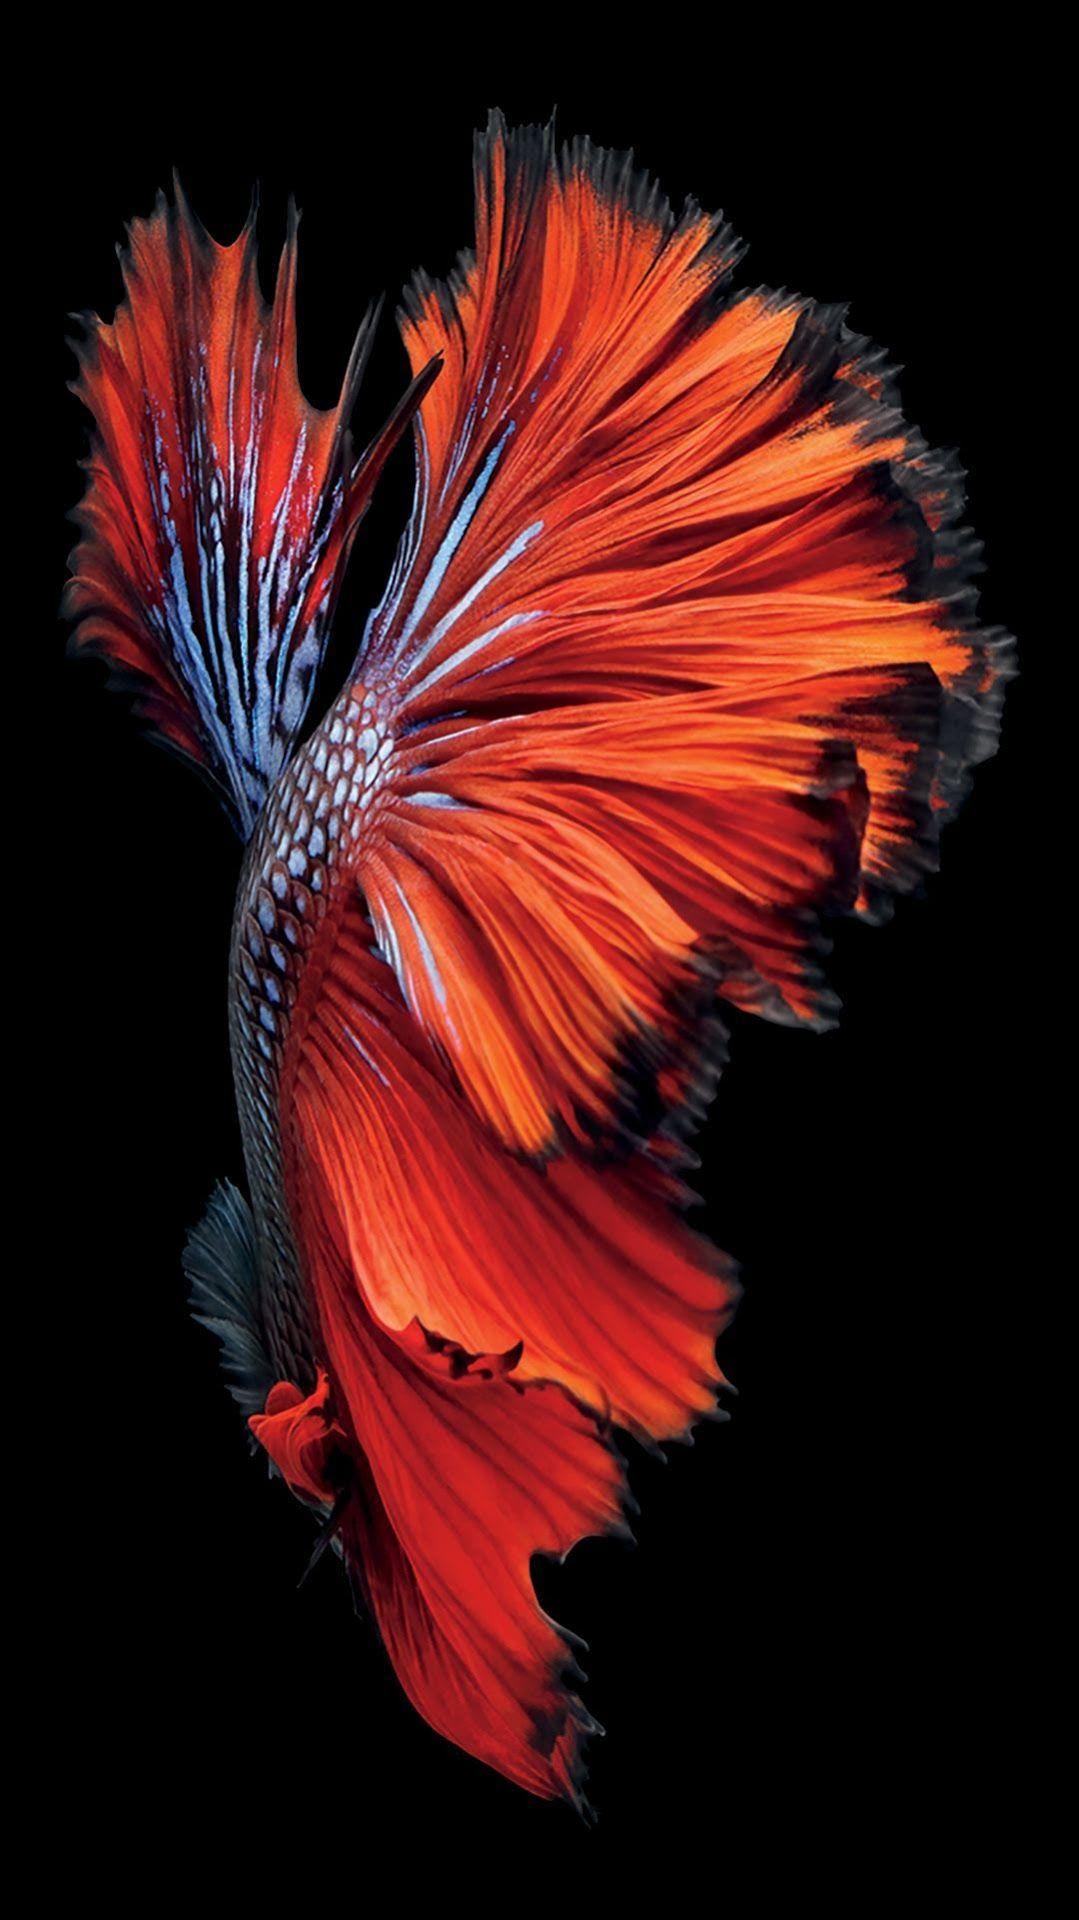 Iphone 6s Fish Red Wallpaper Ios9 Fond Ecran Iphone 6 Fond D Ecran Telephone Fond Ecran Samsung